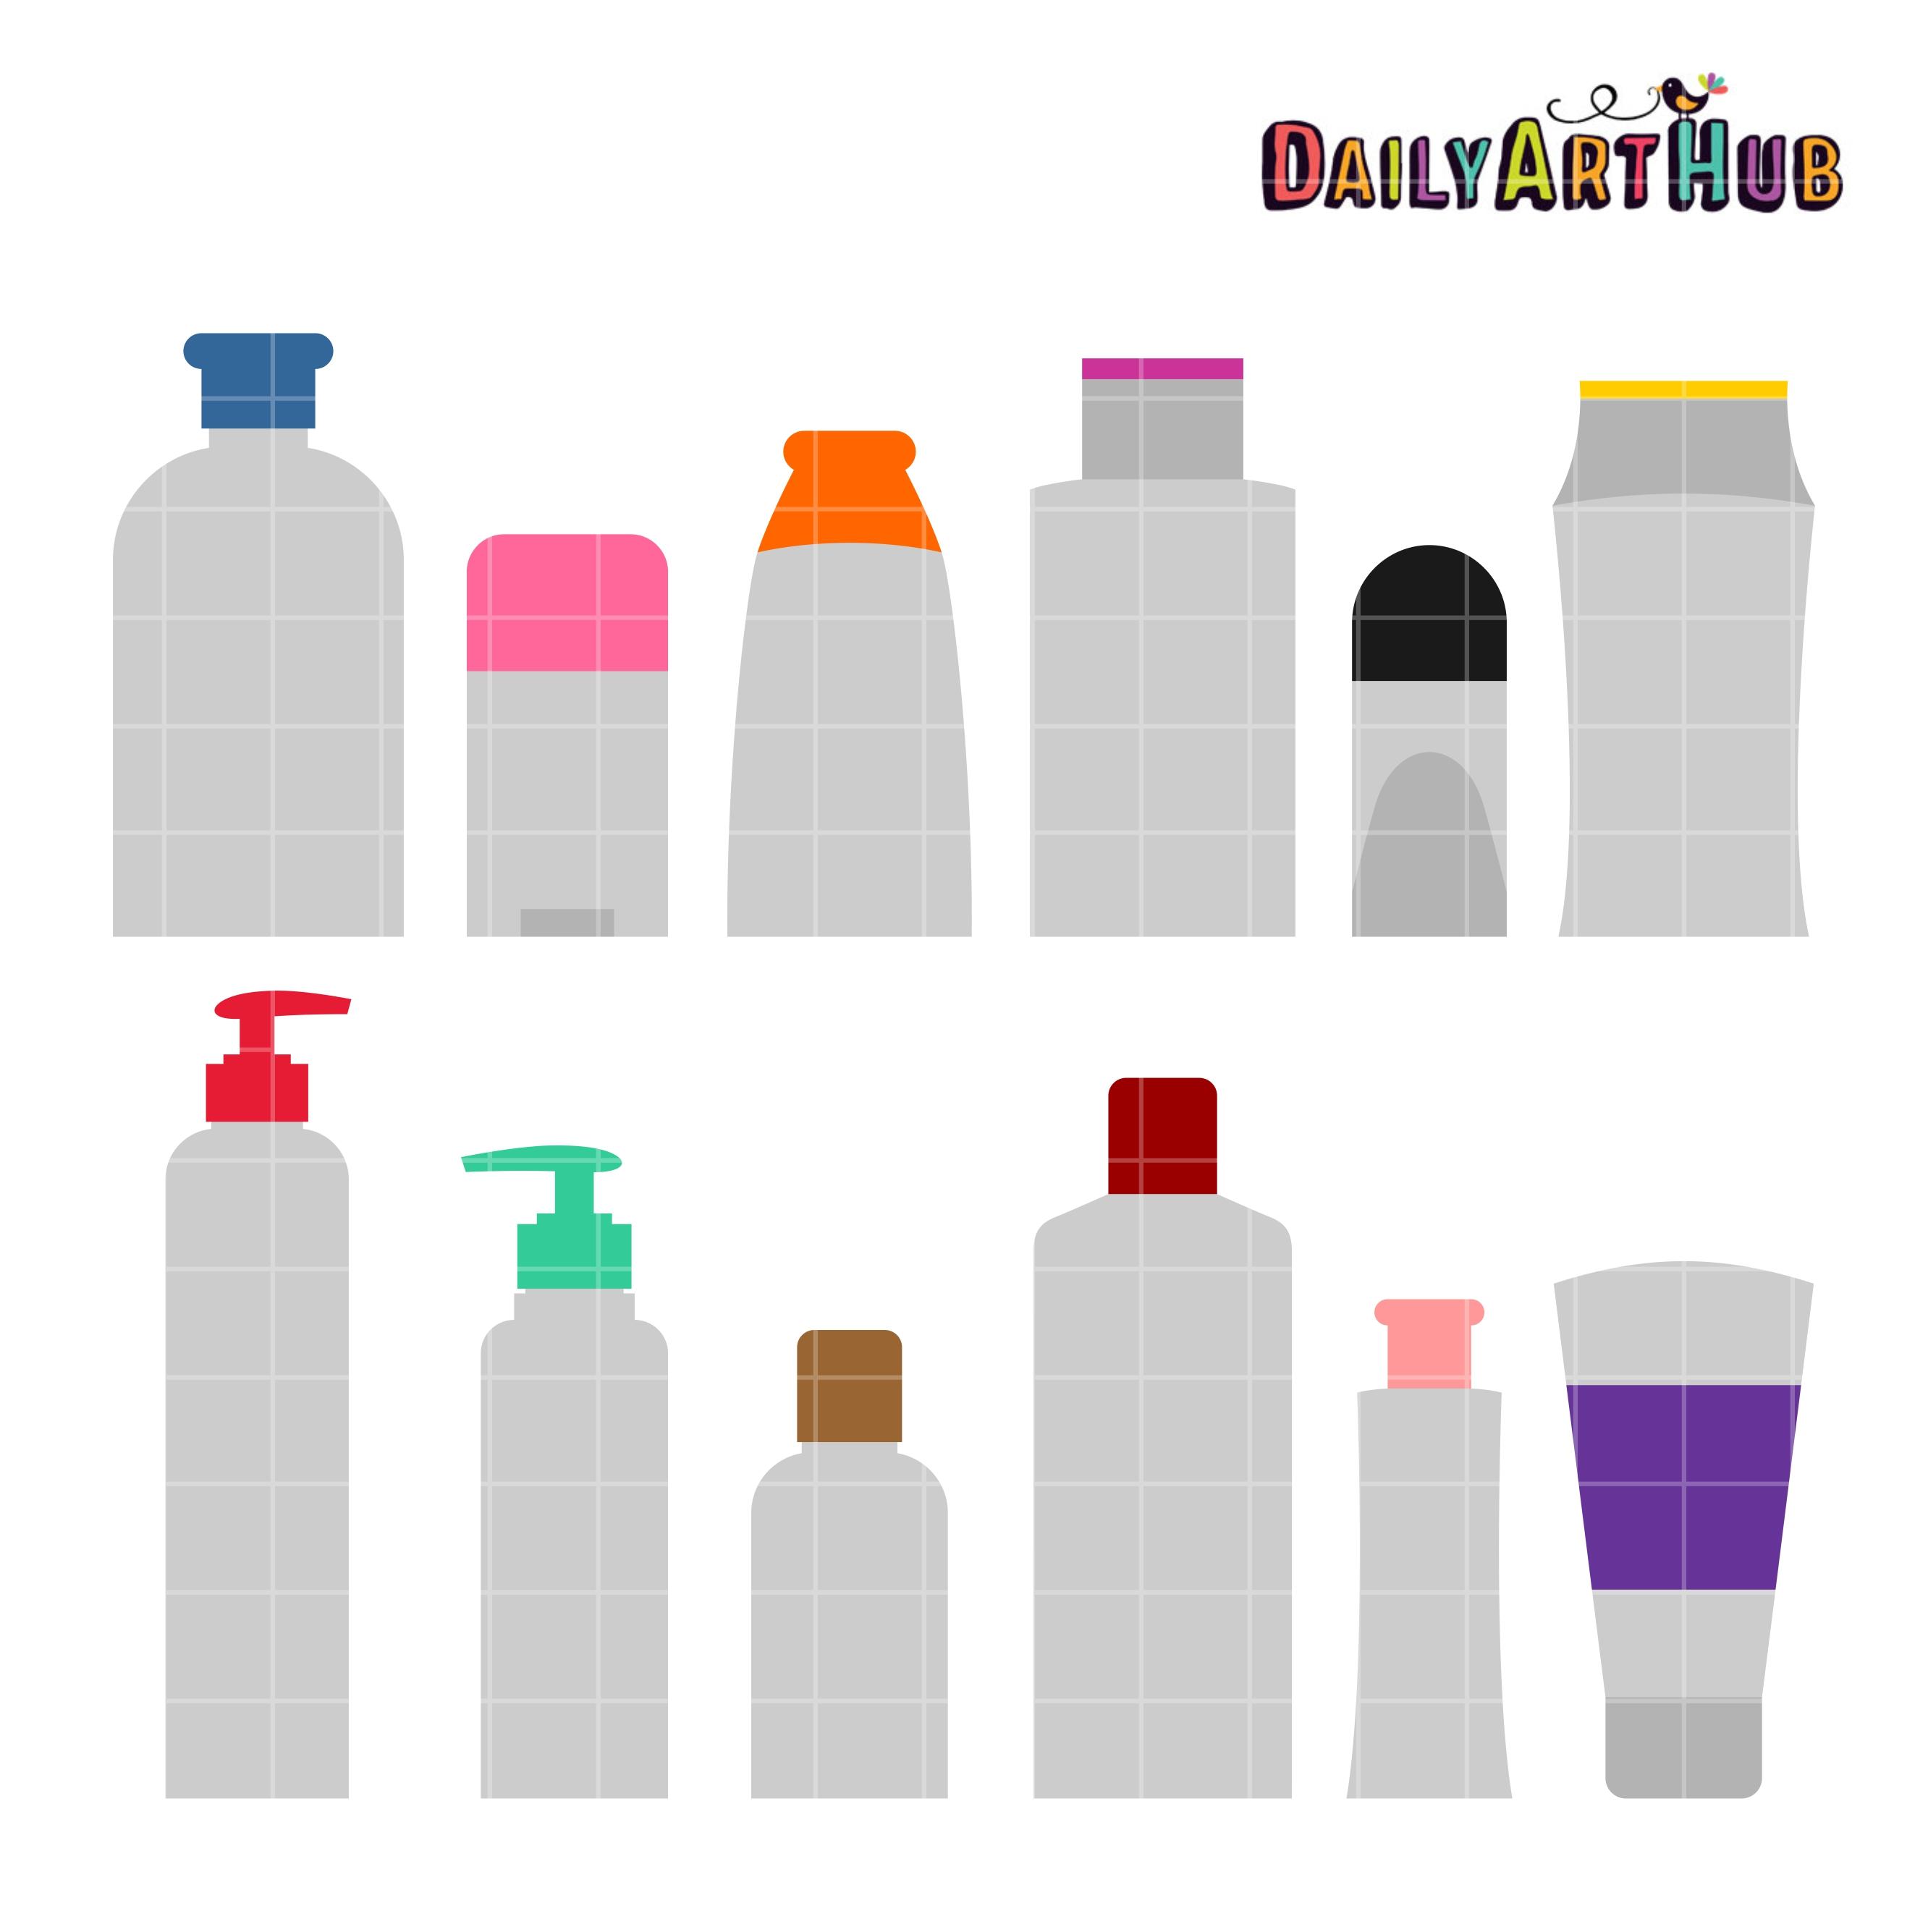 Toiletries Bottle Shapes Clip Art Set – Daily Art Hub – Free Clip Art Everyday